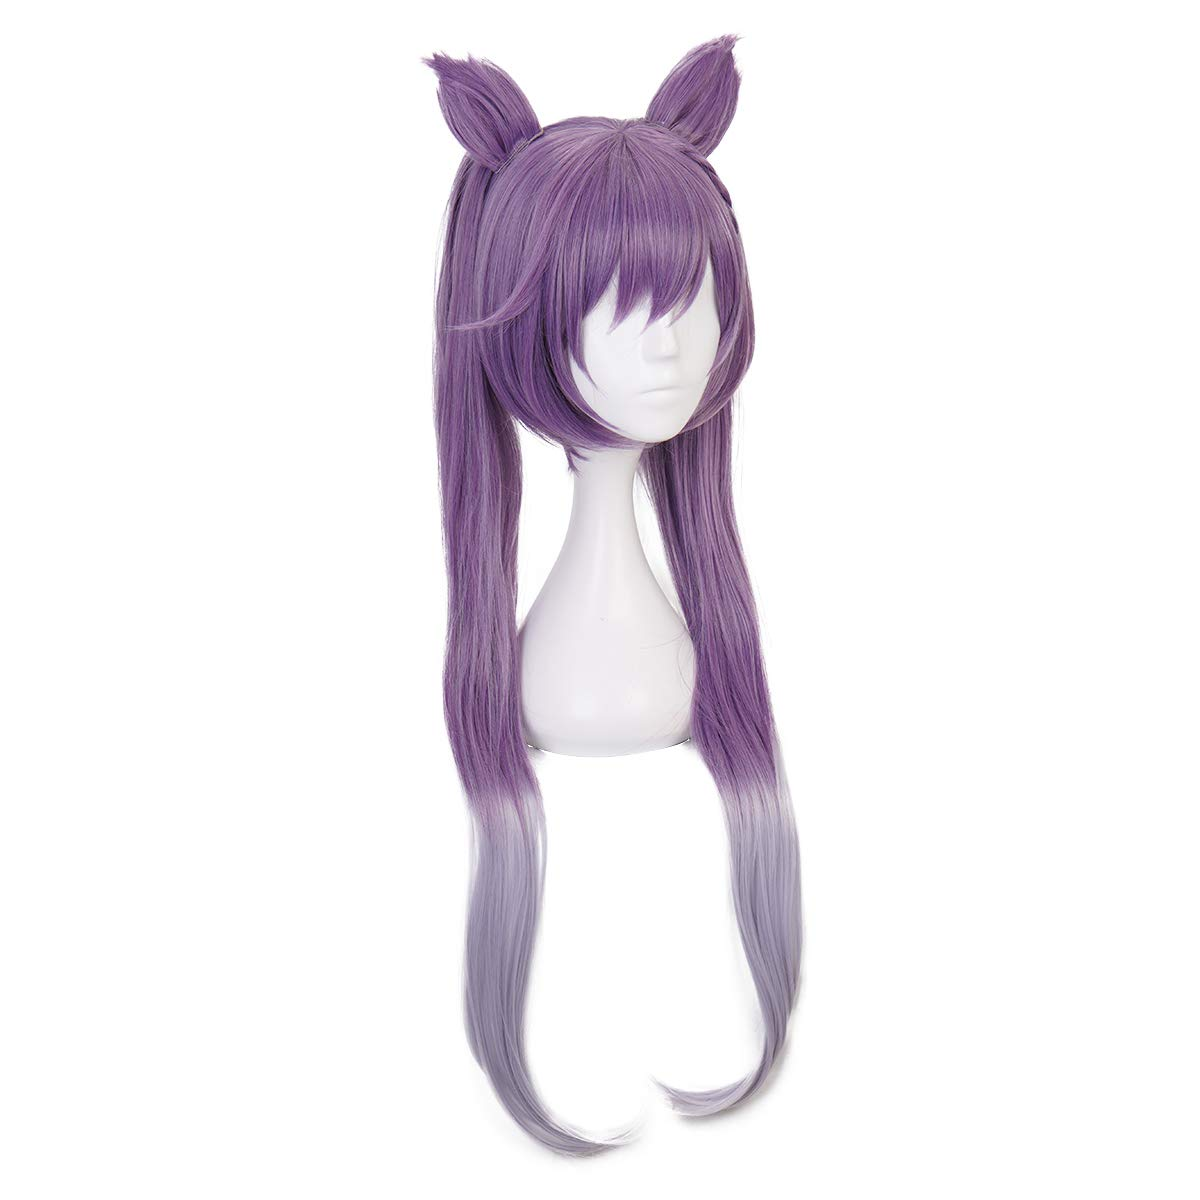 Qiancoshair Genshin Impact Keqing Cosplay Wig Long Purple Synthetic Hair Wig with Ears for Halloween Party Wig (Keqing) : Beauty - Amazon.com